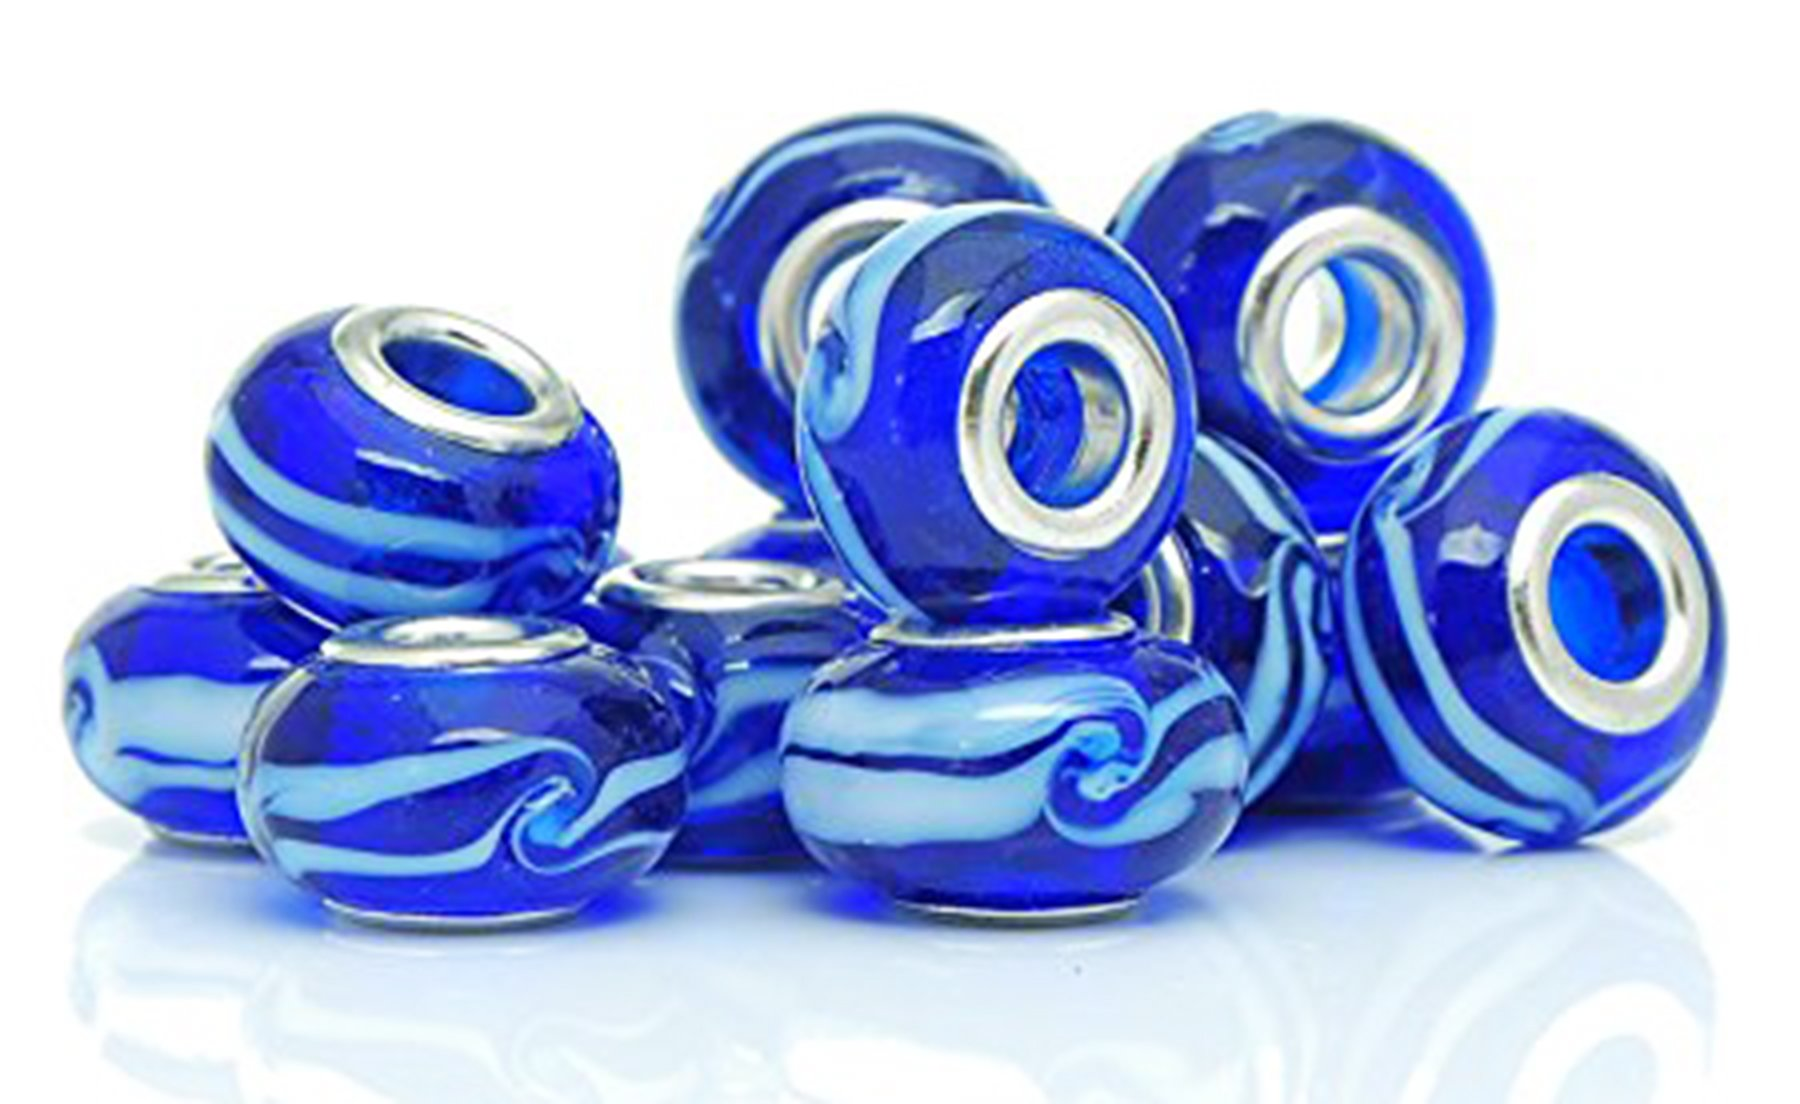 Best Wing Jewelry ''Blue Ripple'' Lamp Work Glass Charm Bead for Snake Chain Bracelets (10 Pcs)